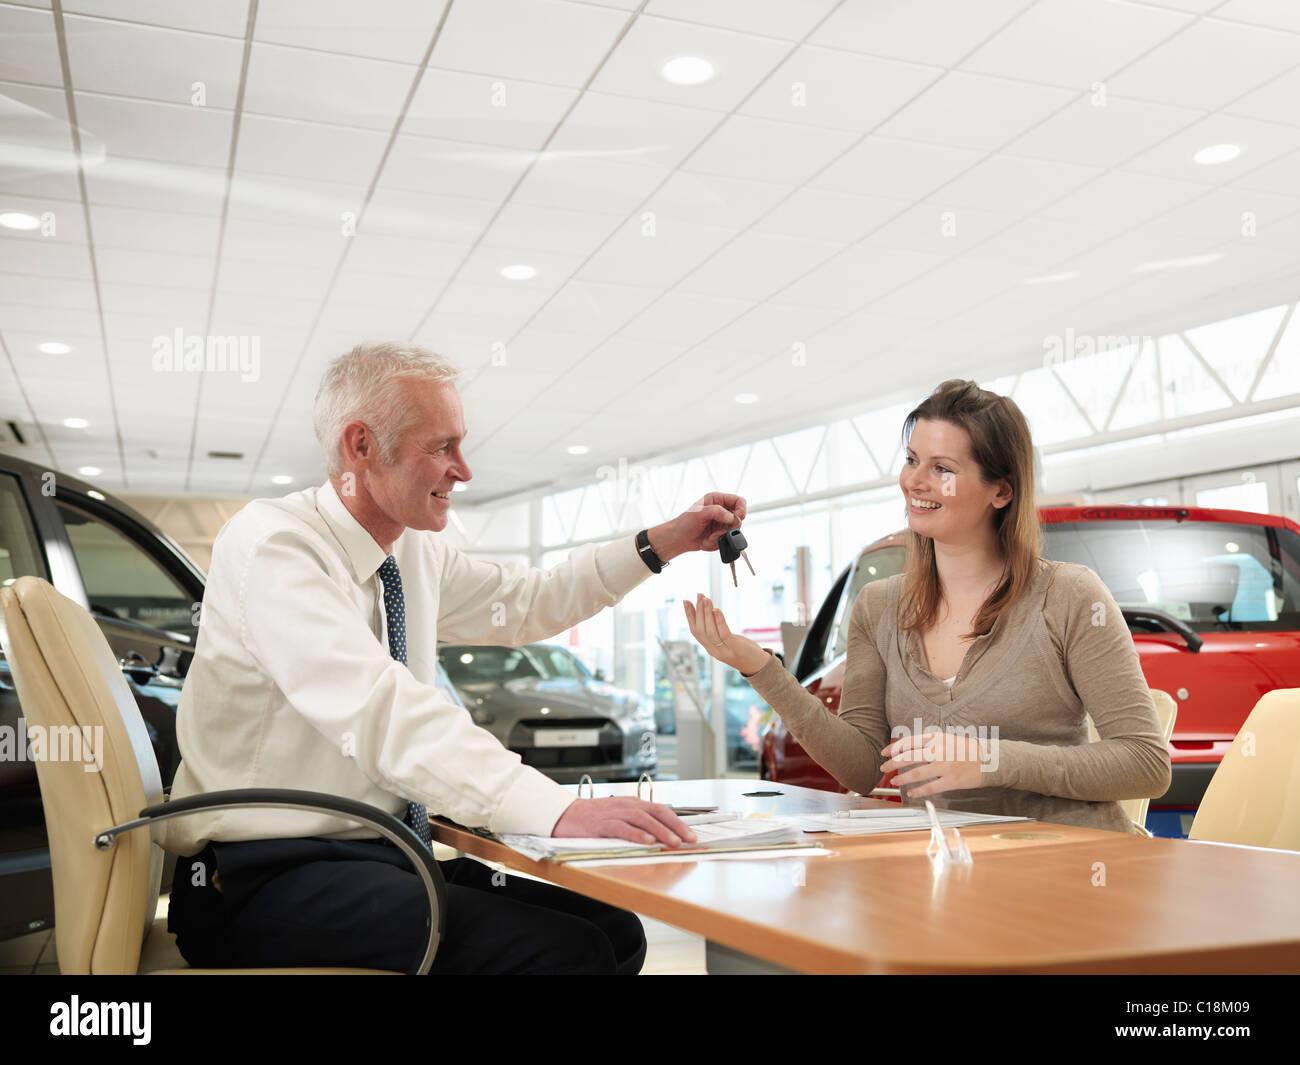 Salesman and customer in car dealership - Stock Image